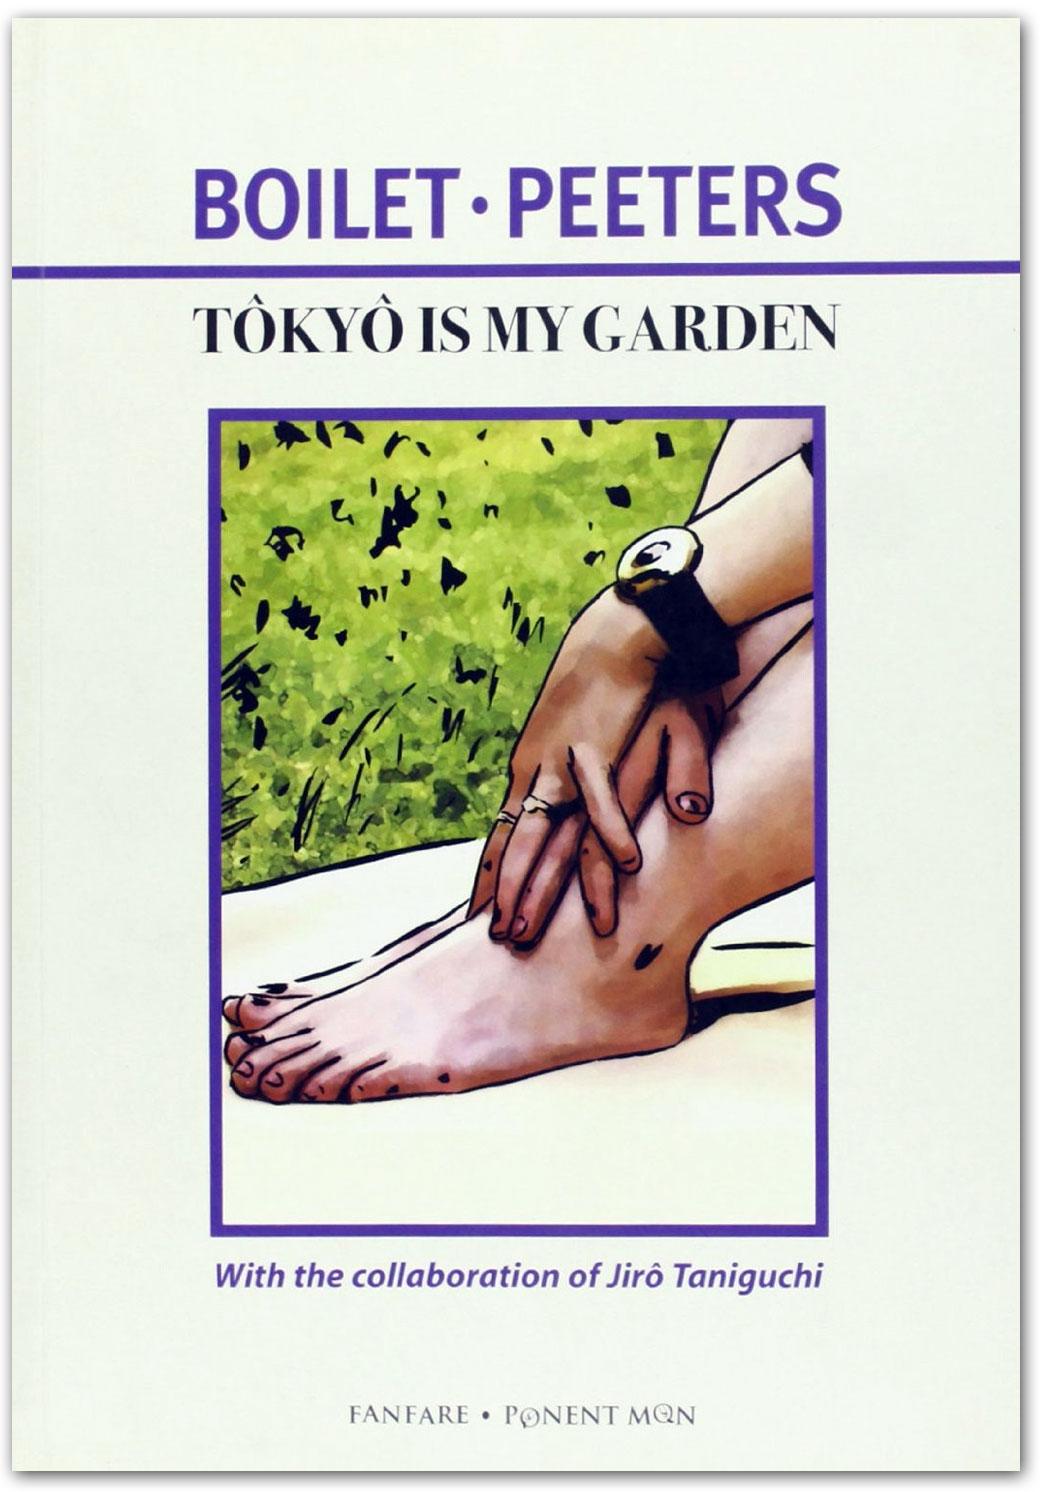 Tokio es mi jardín - Boilet / Peeters